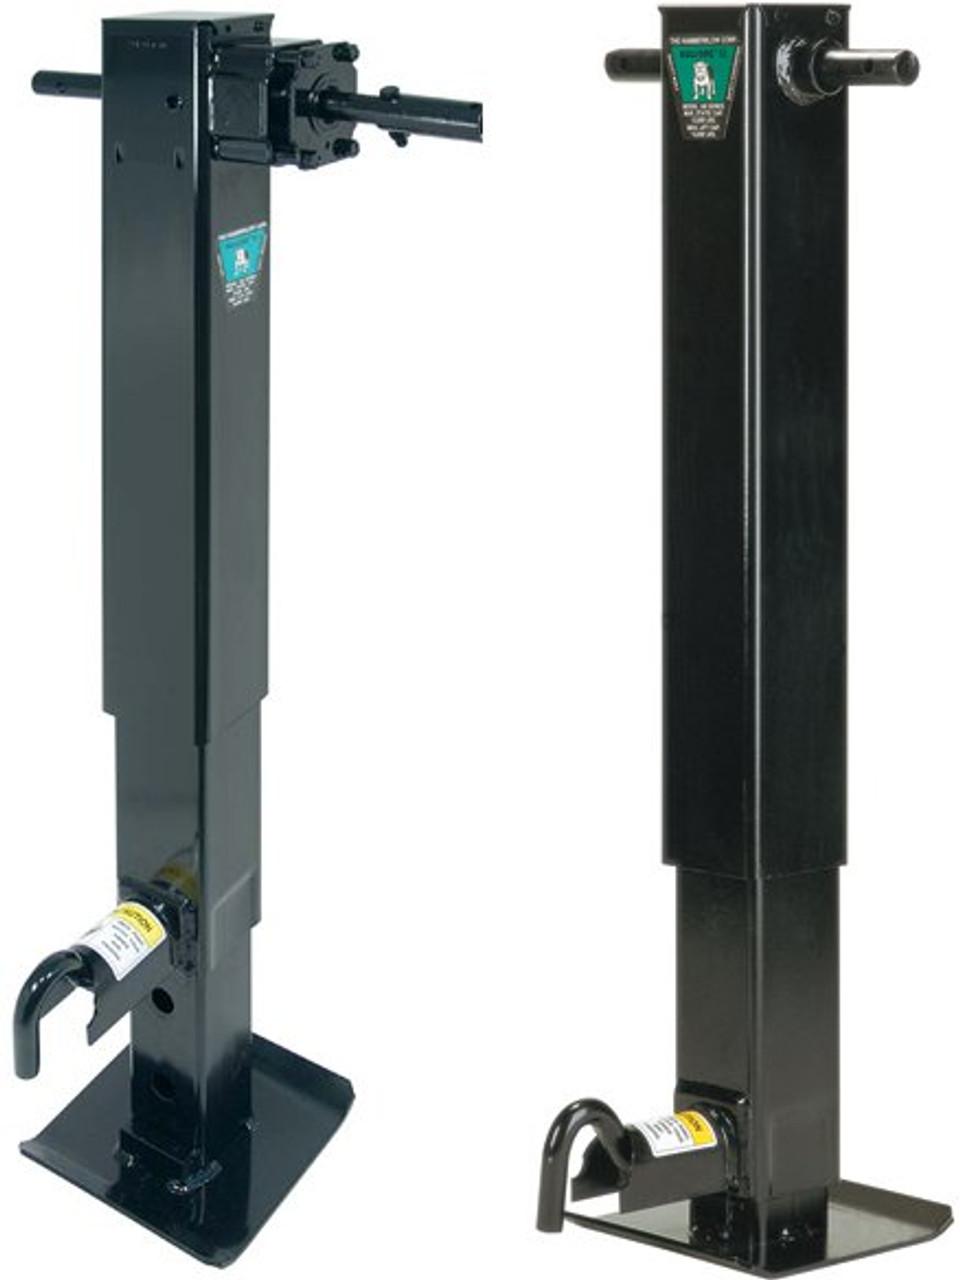 183817-17 --- BULLDOG Two Speed Drop Leg Trailer Jack with Companion Jack - 20,000 lb